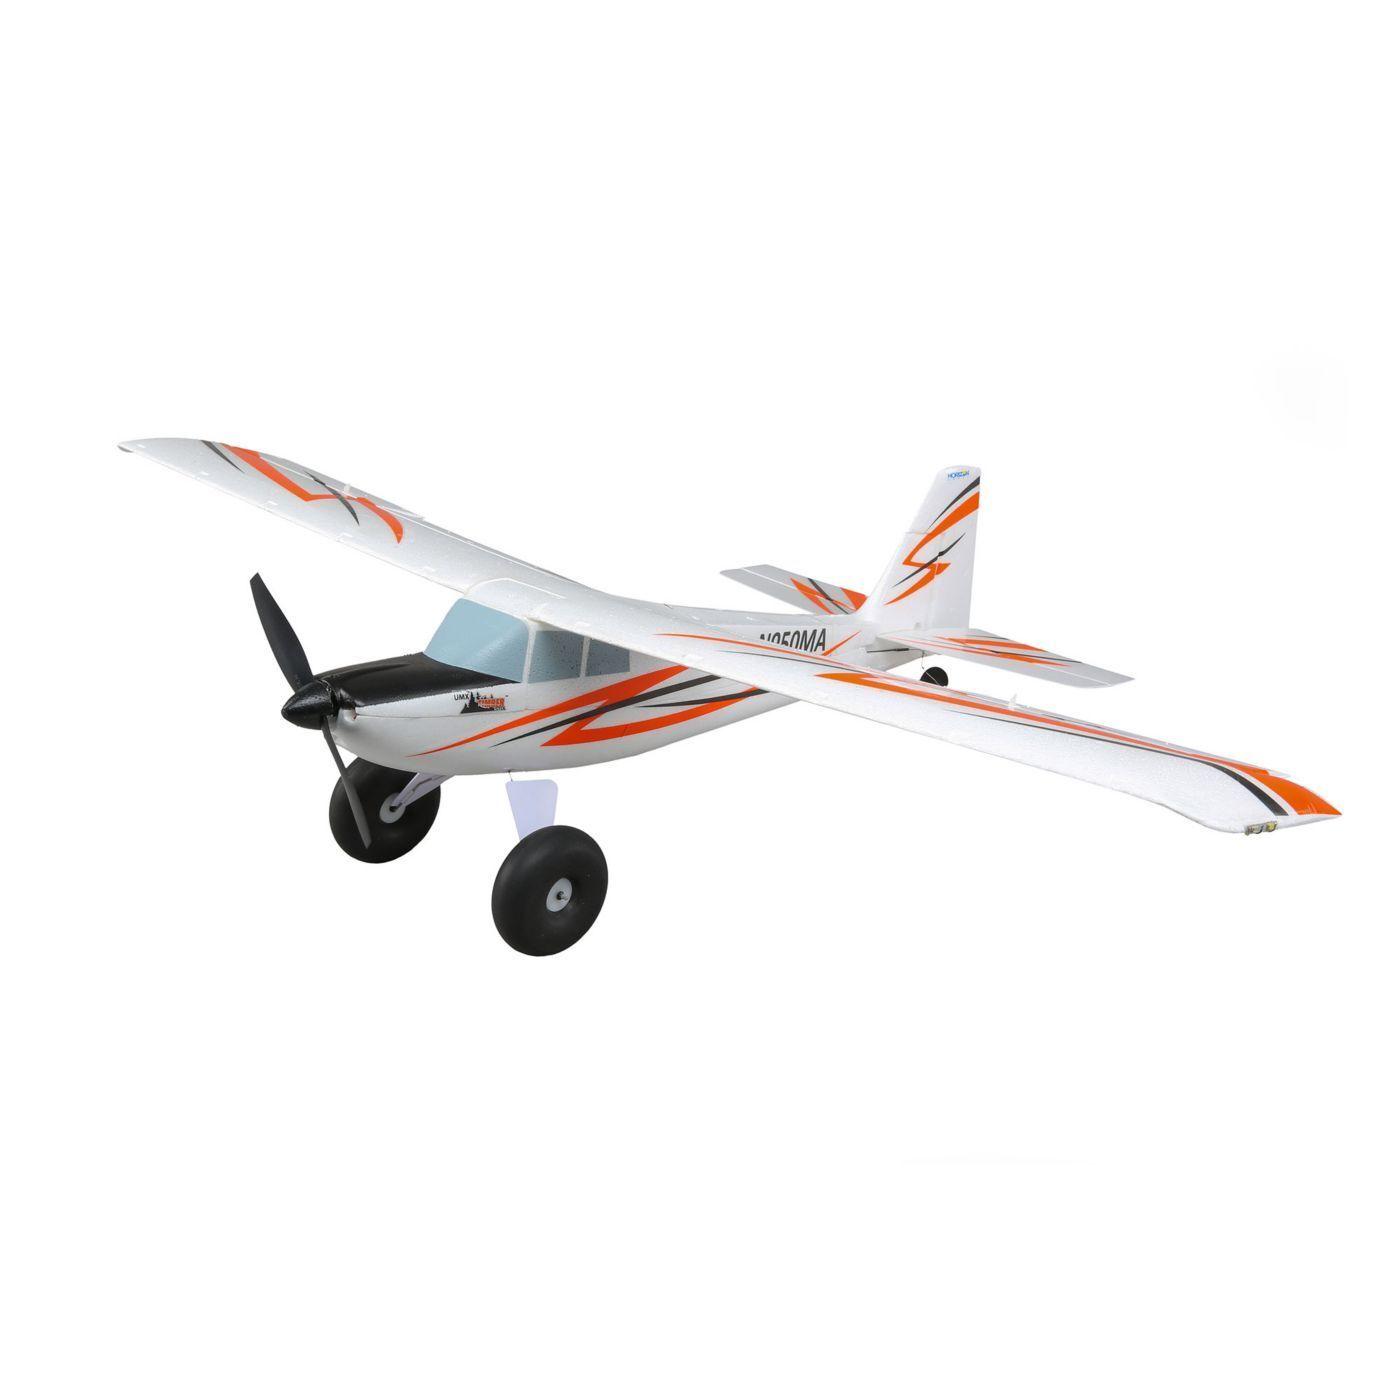 E-Flite UMX Timber BL Brushless Bind And Fly Basic R/C Airplane EFLU3950